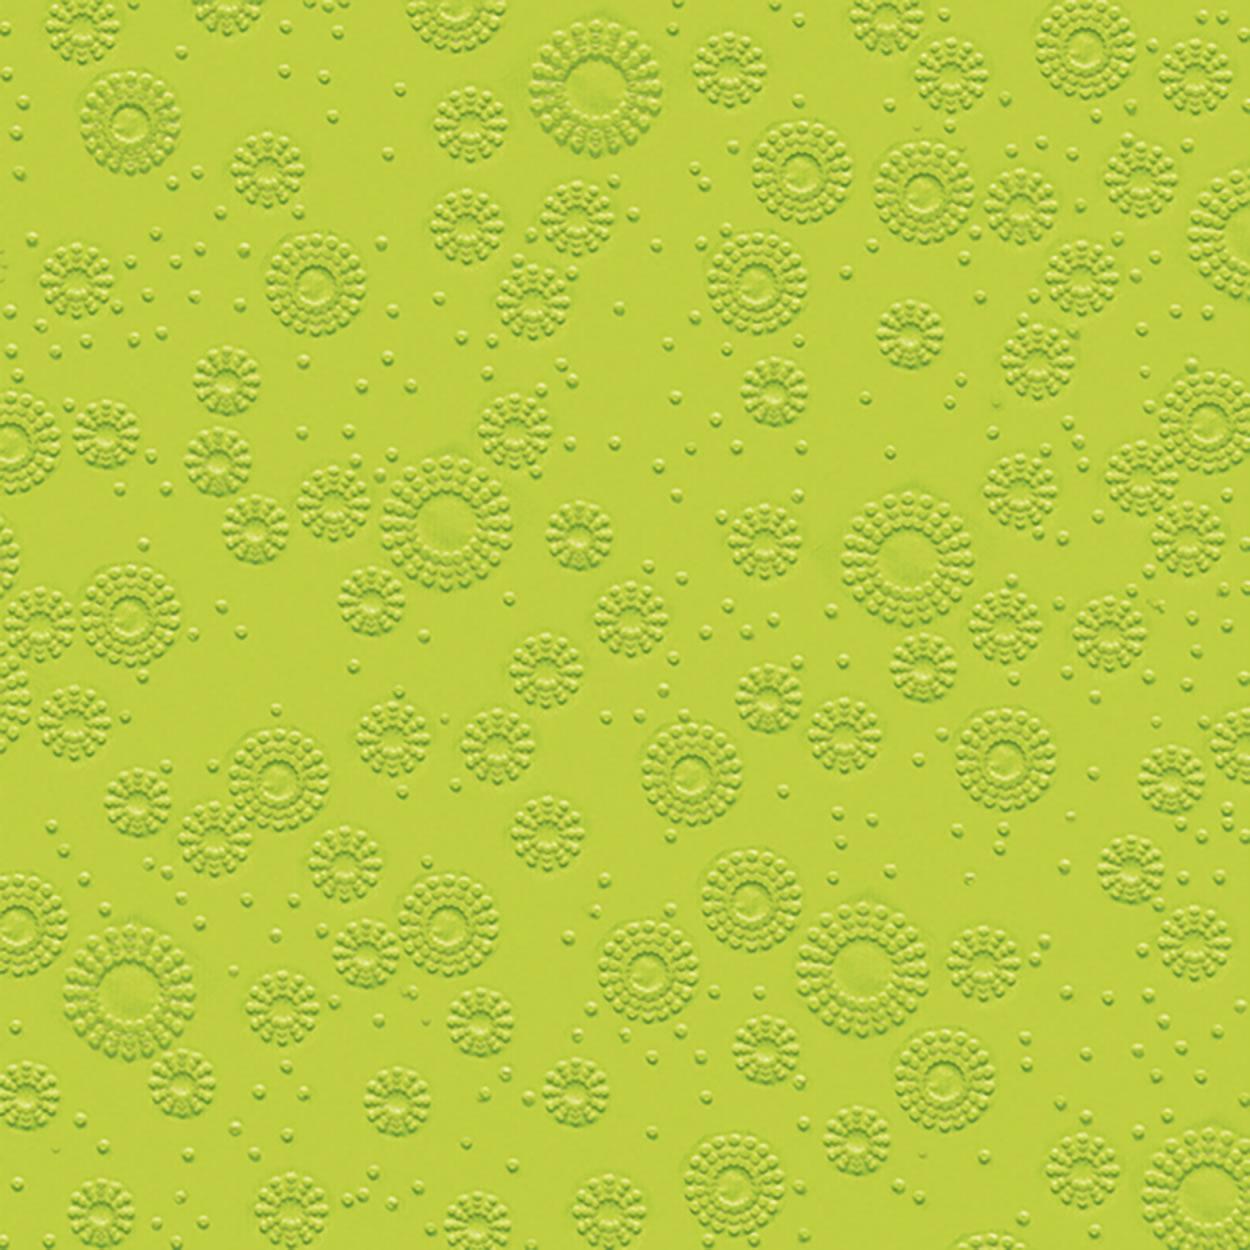 Dinner Servietten Moments - uni kiwi, dinnerservietten,  grün